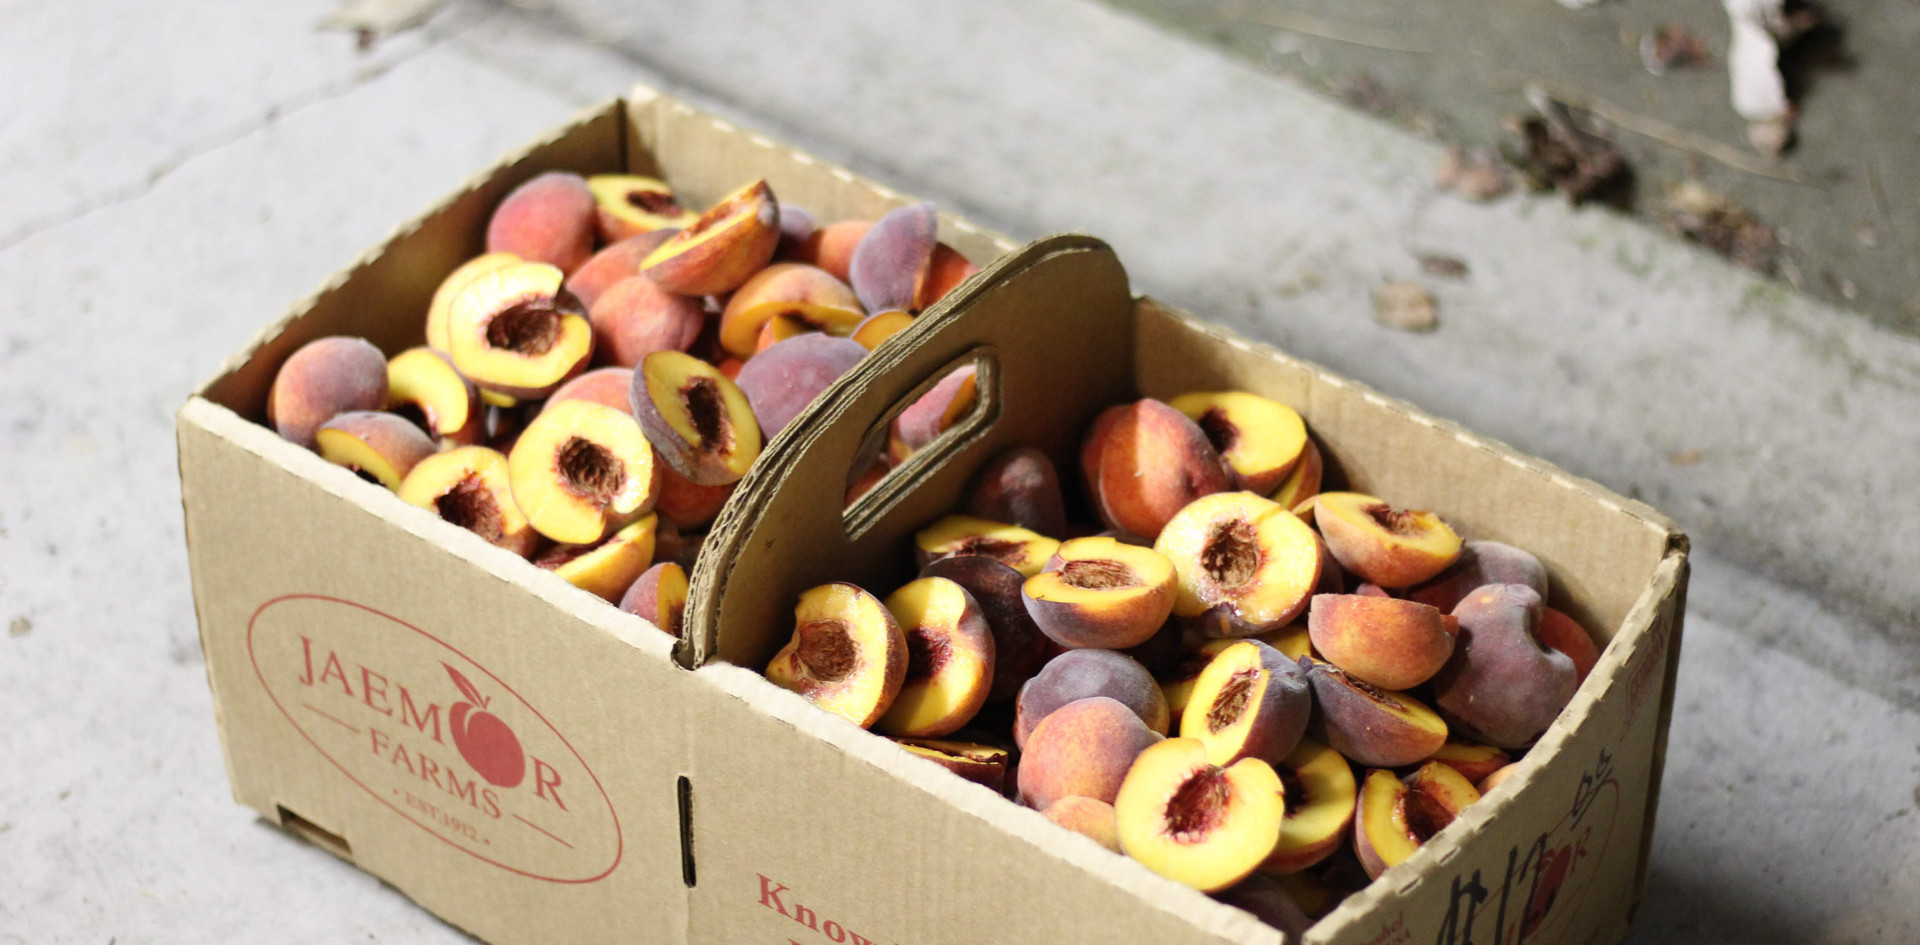 leprechauno-peaches-on-the-grill-1.jpg